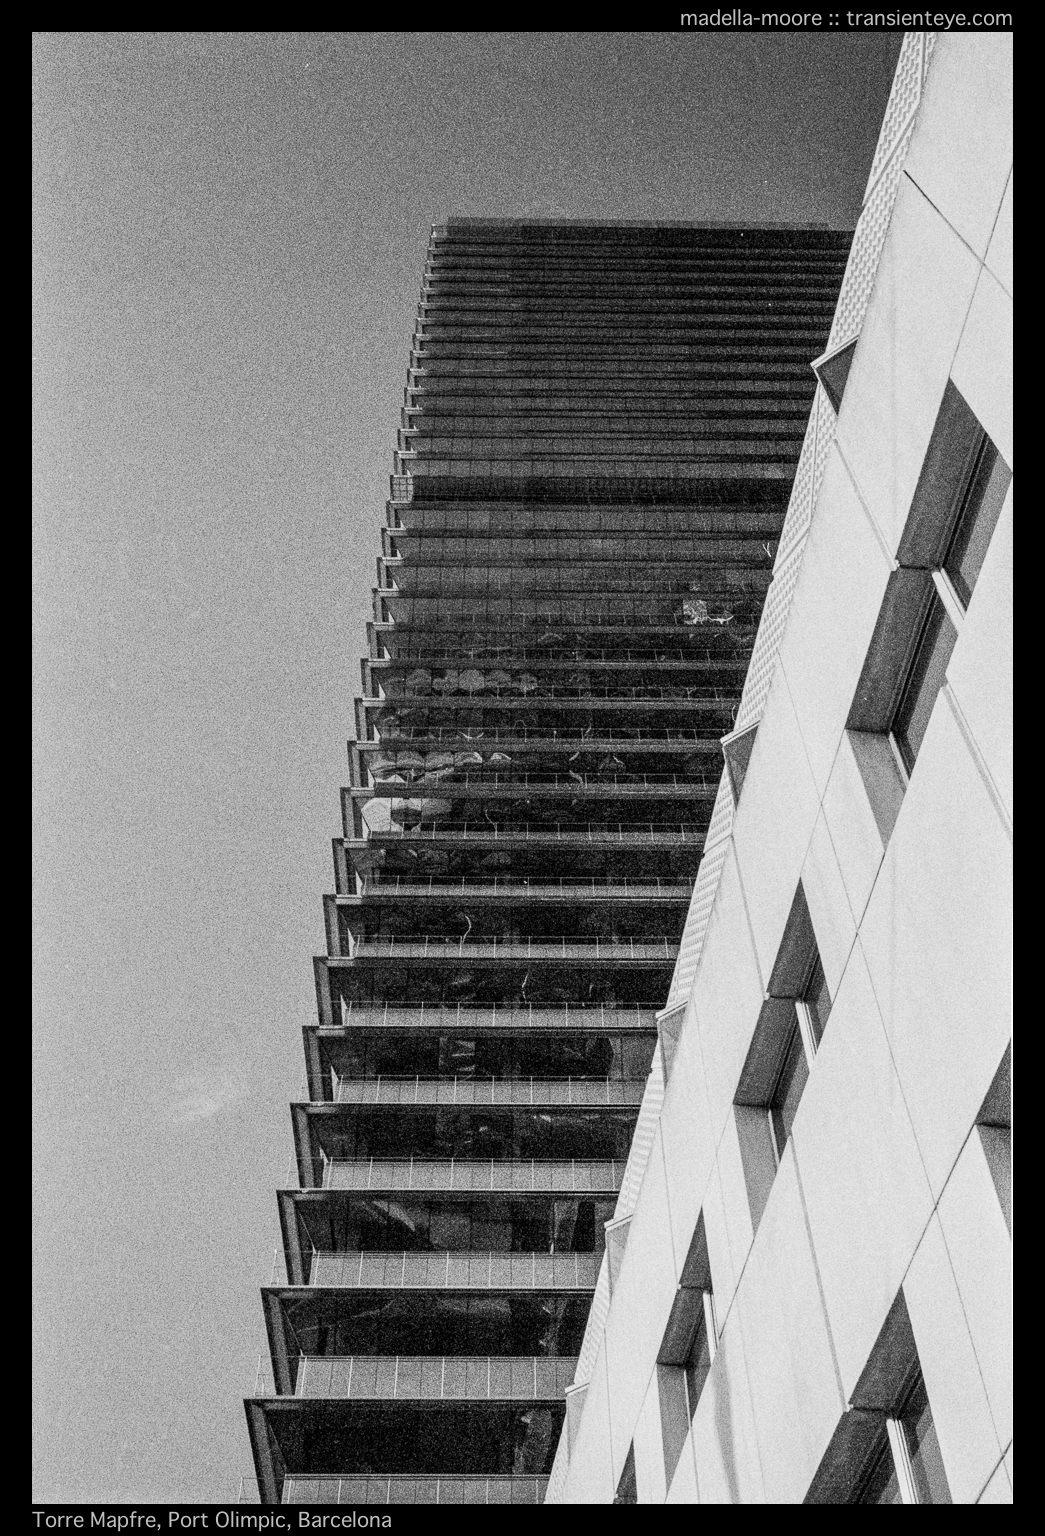 Torre Mapfre, Port Olímpic, Barcelona. Leica M7 with Zeiss ZM 2/35.